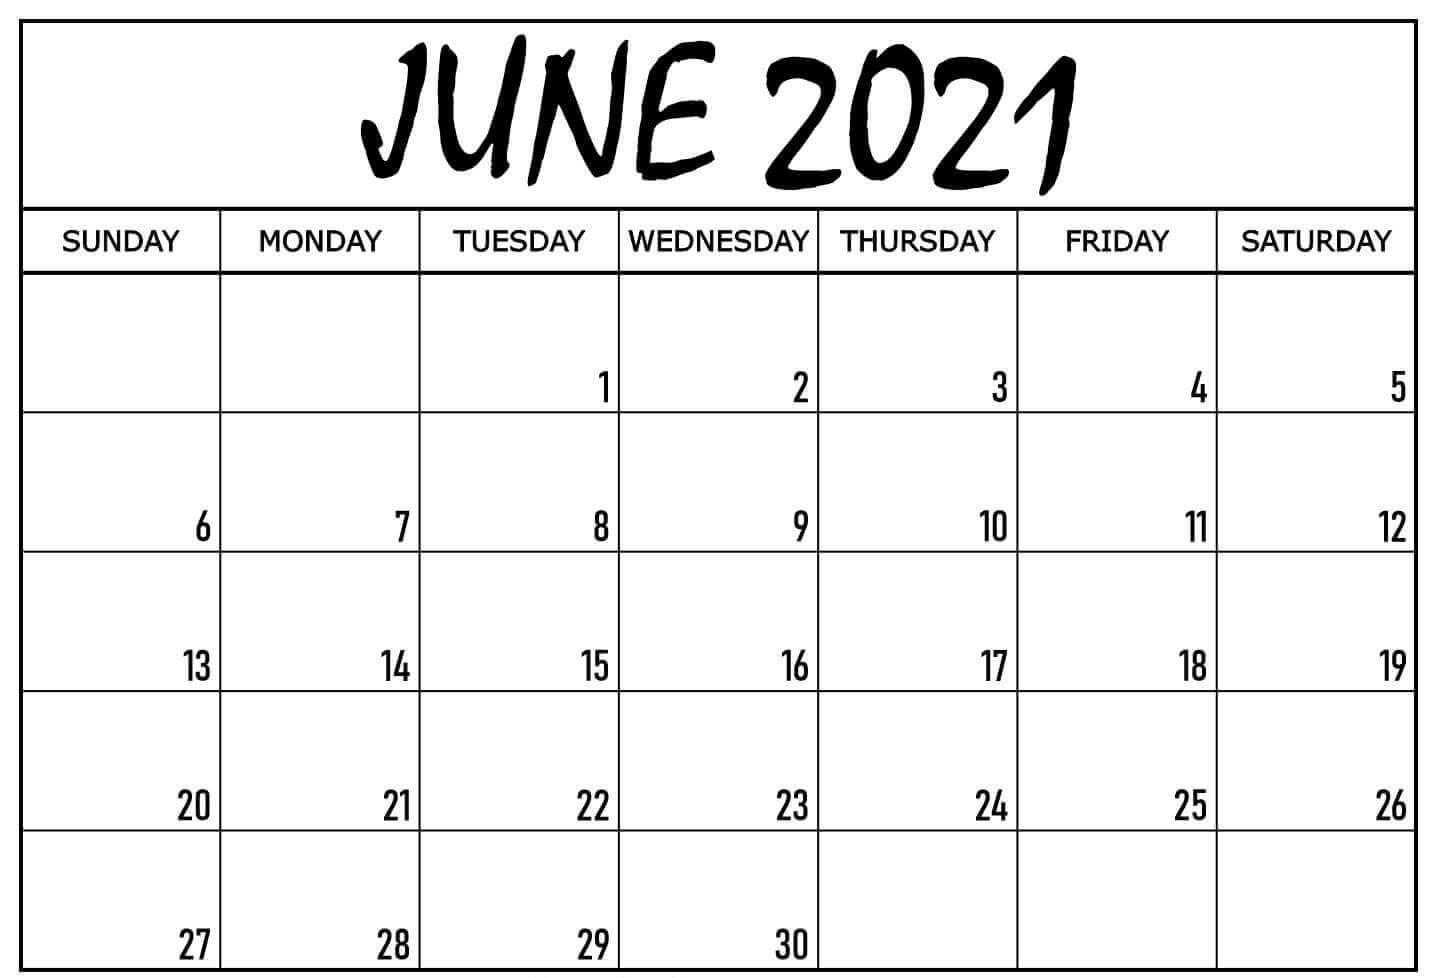 Blank Calendar Template June 2021